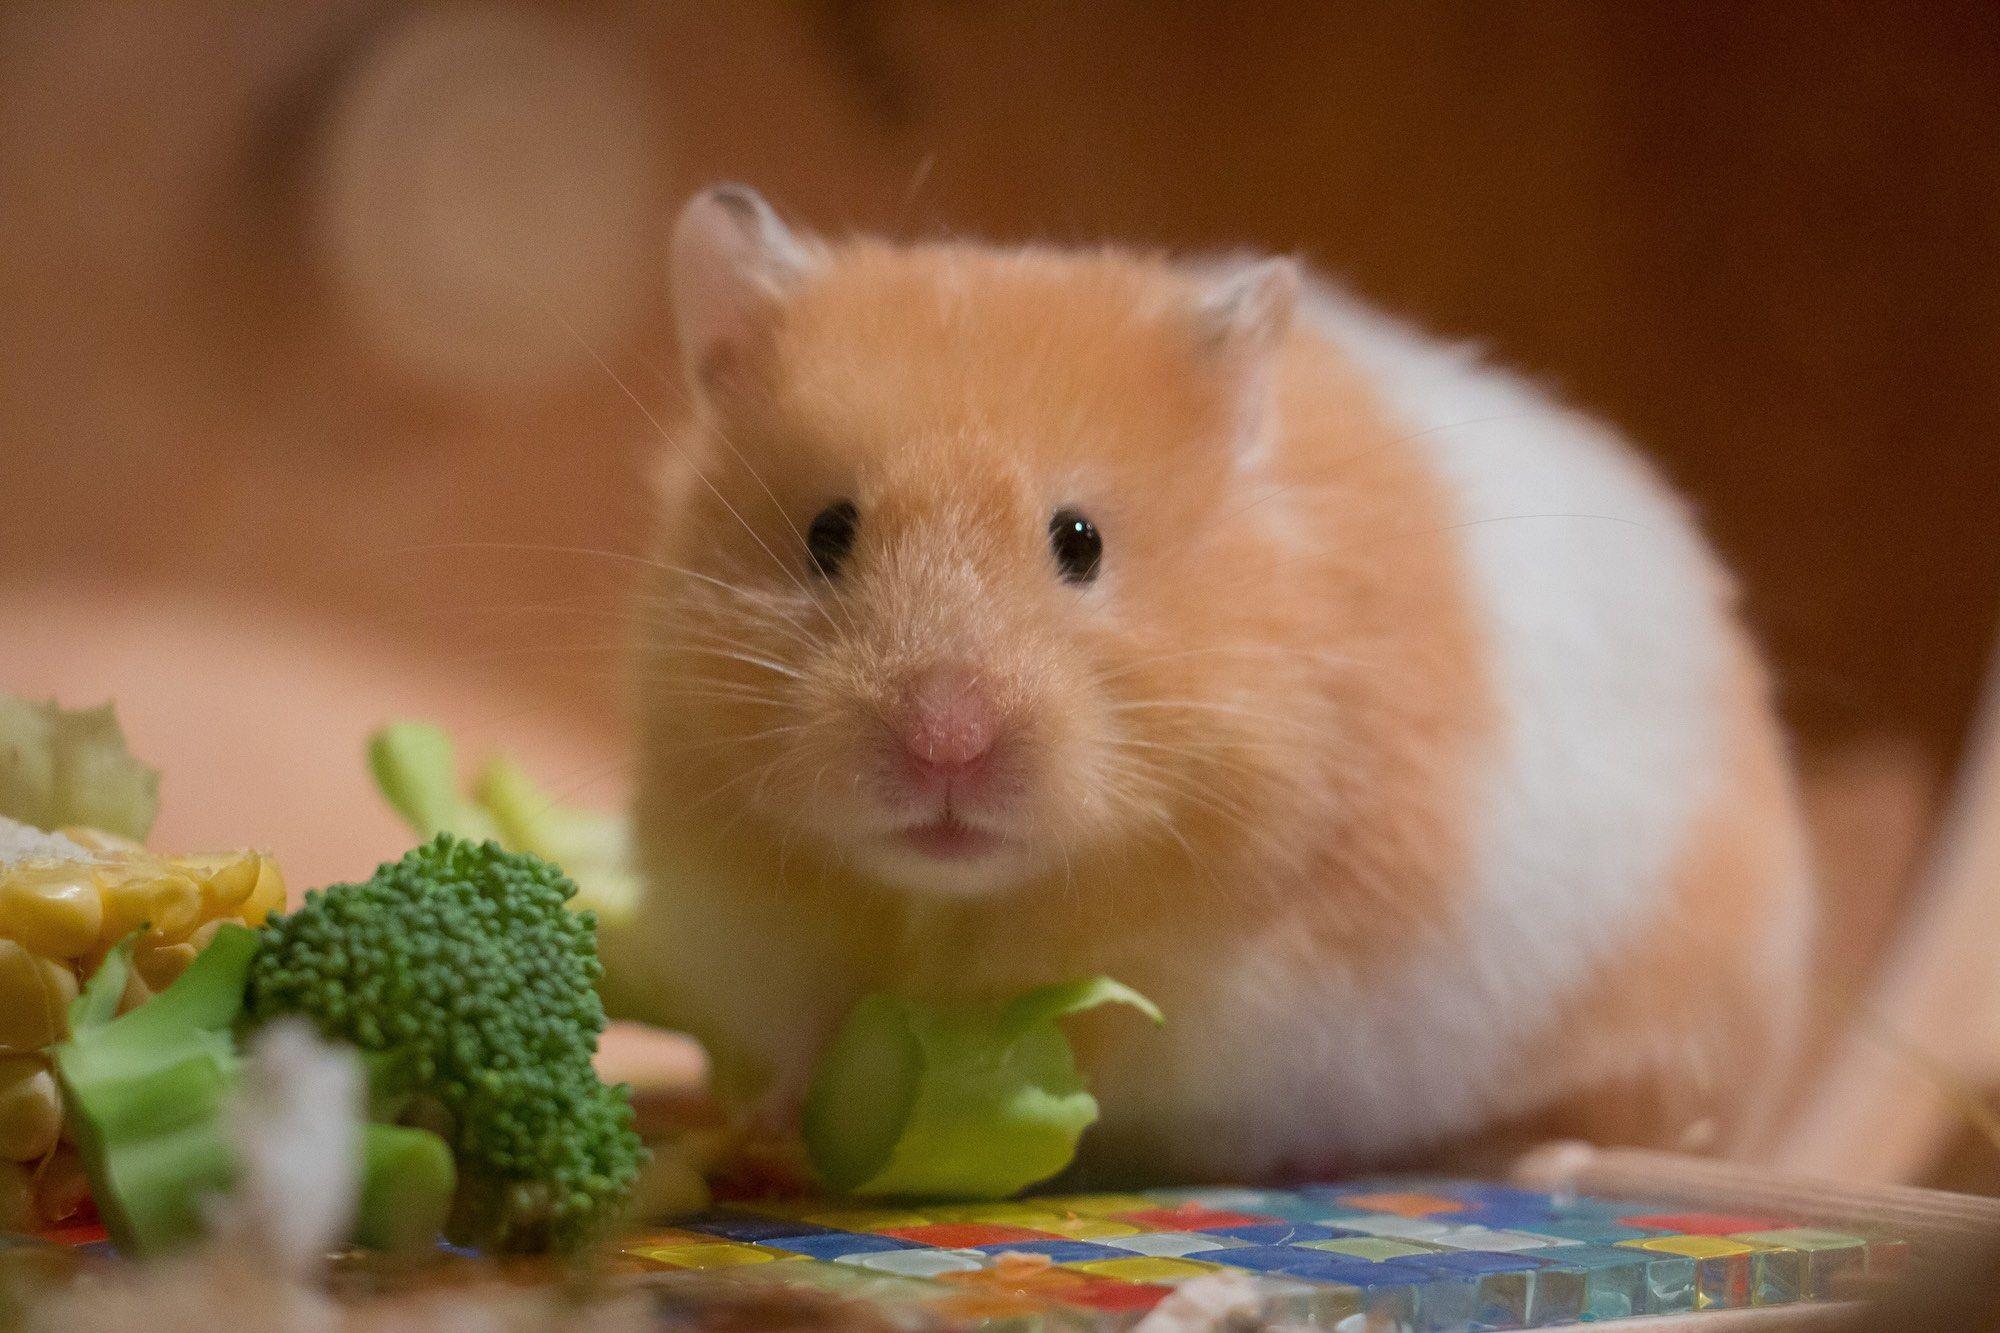 Choose A Cute Hamster Name Elmens In 2020 Cute Hamster Names Cute Hamsters Dwarf Hamster